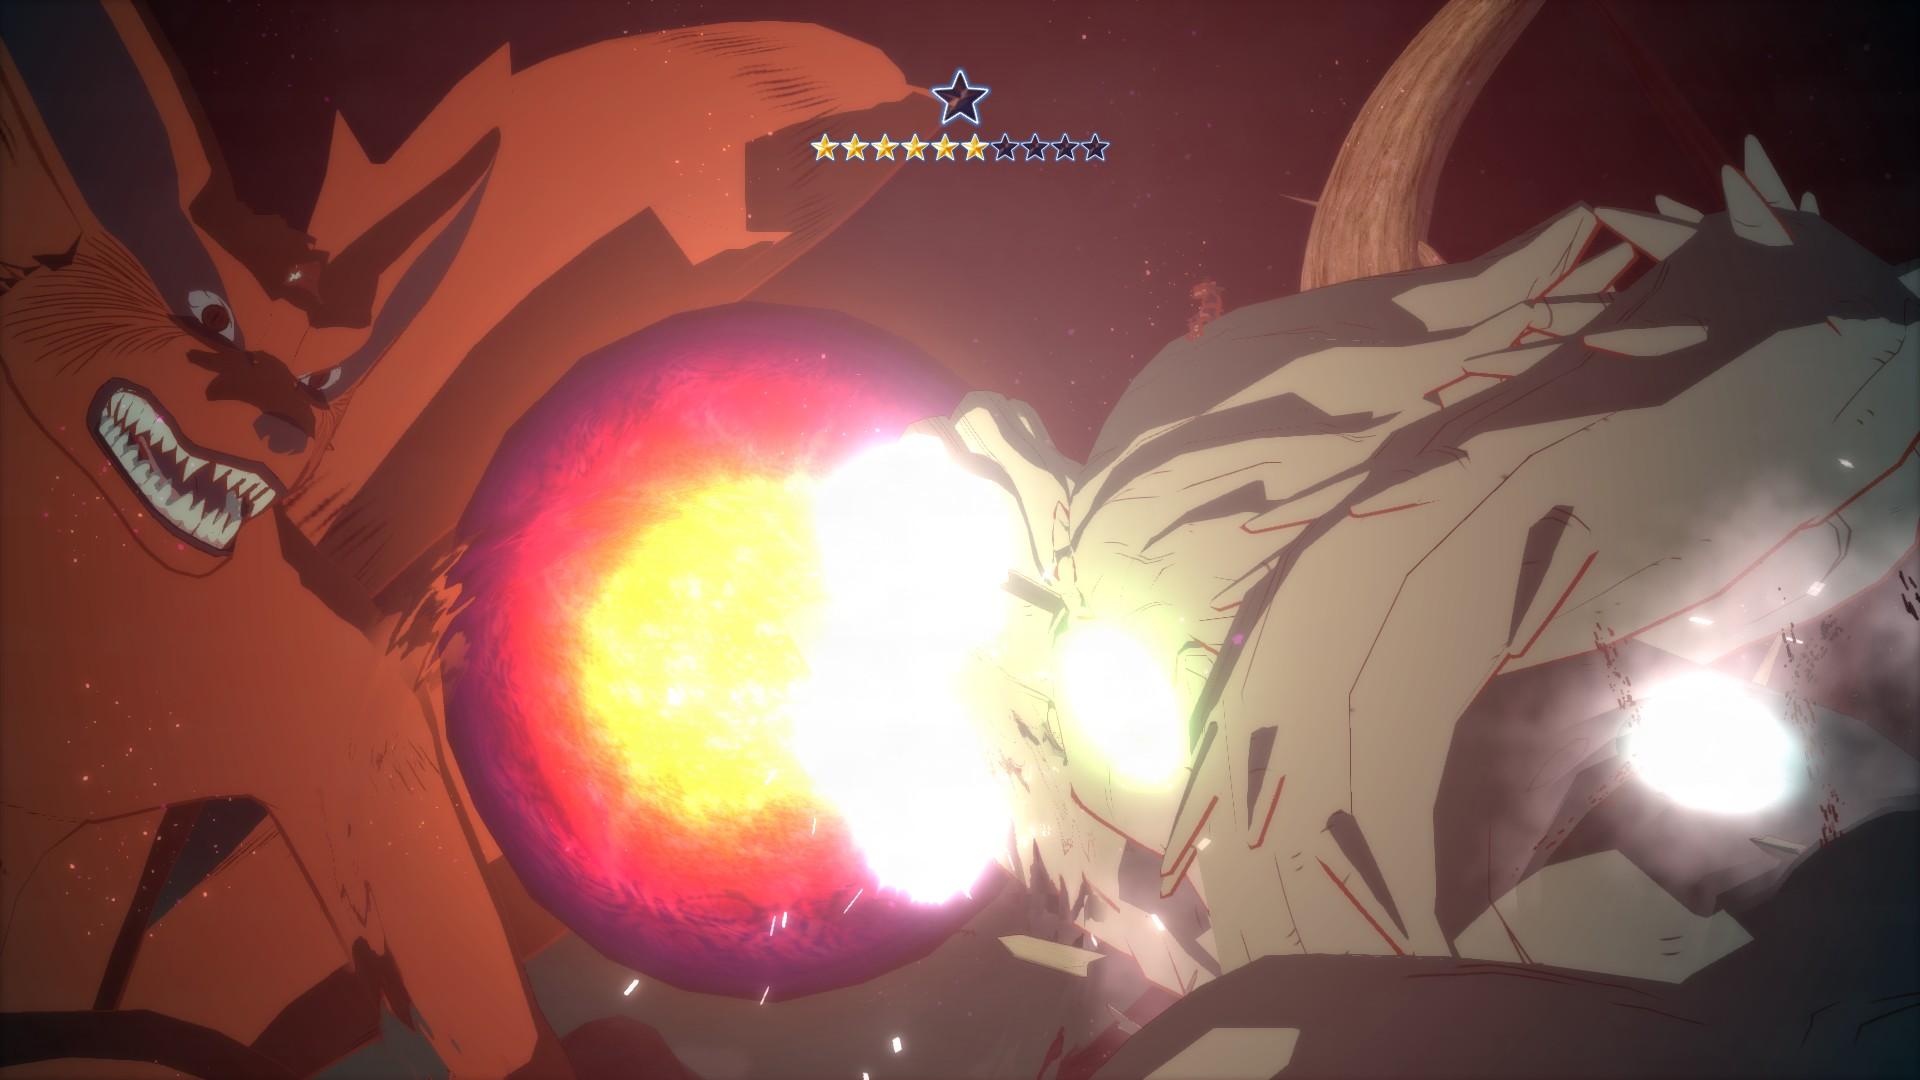 Steam Community :: Guide :: Naruto Shippuden, A Scroll to